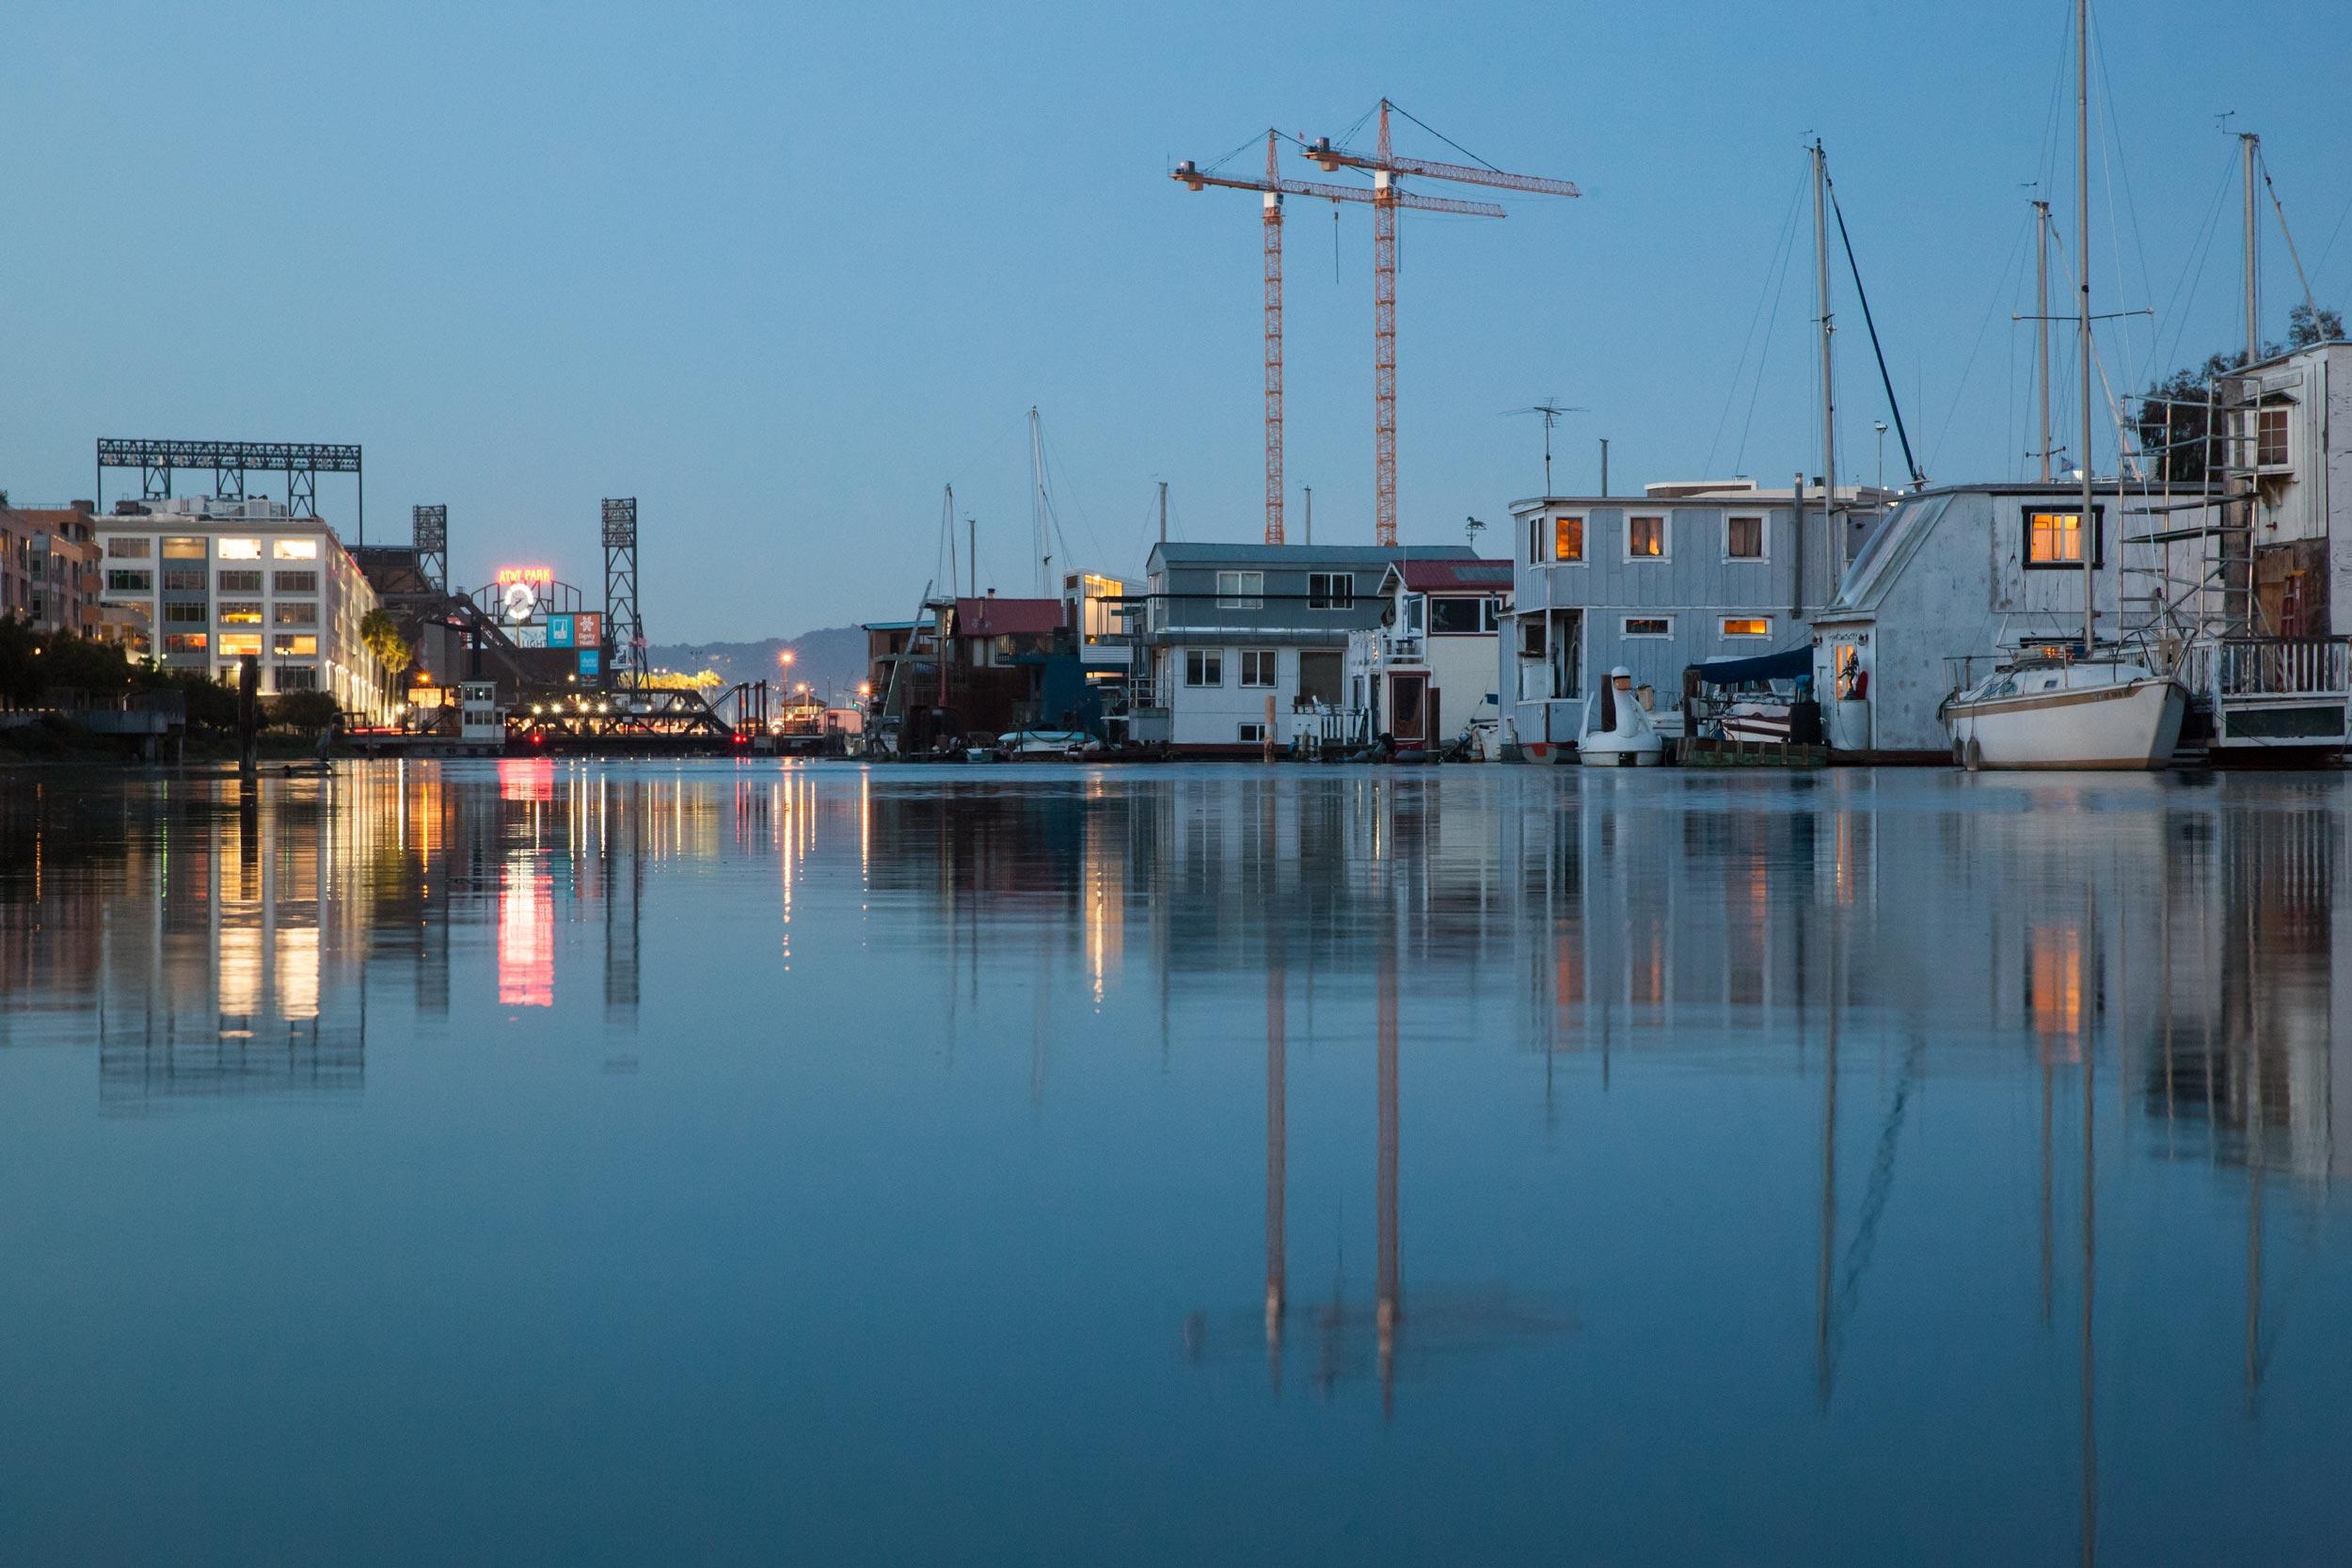 Houseboats-water-AT&TPark-MissionCreek-SF.jpg